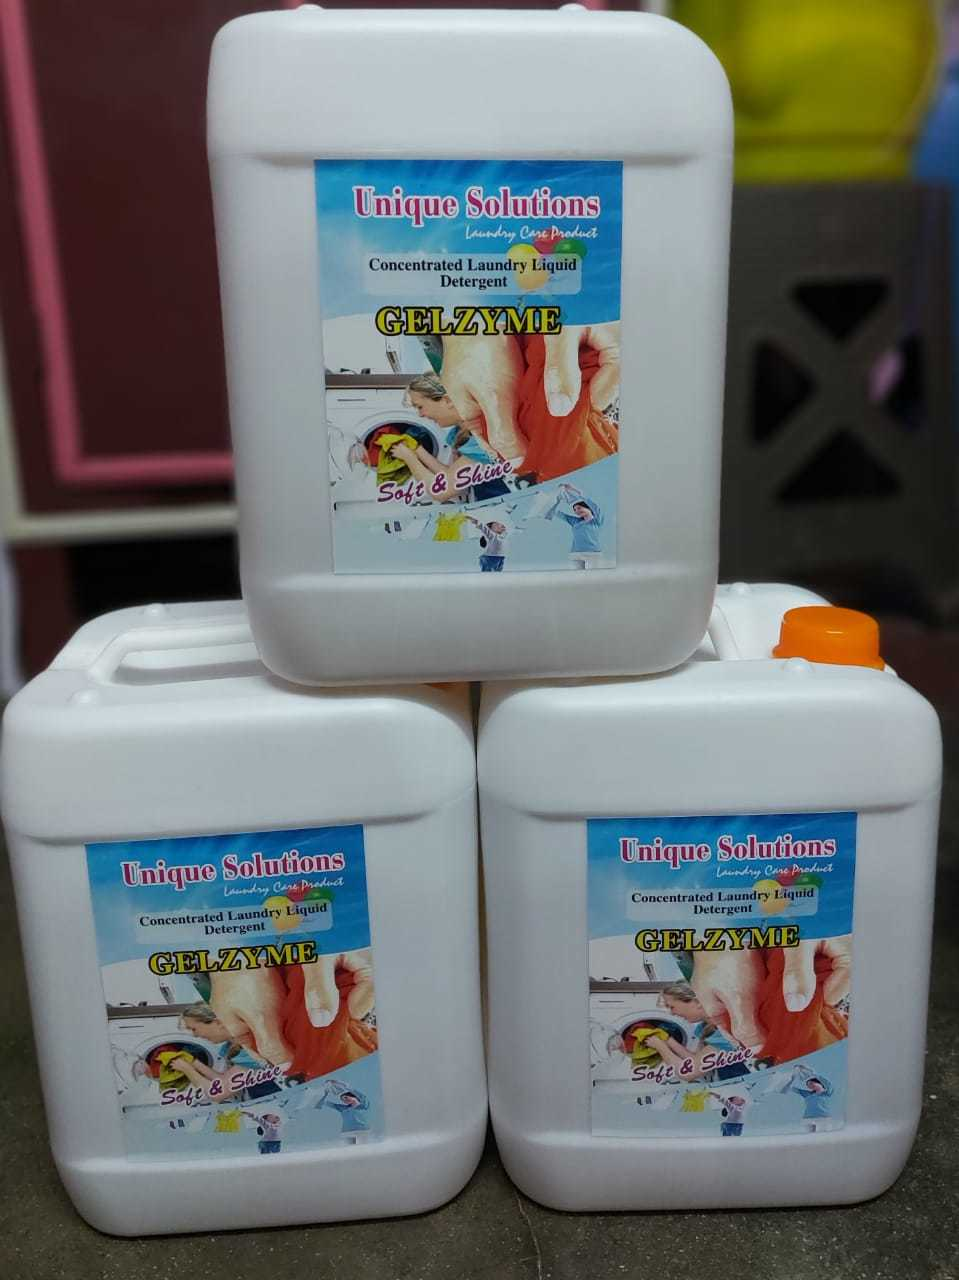 Laundry Liquid Detergent Gelzyme